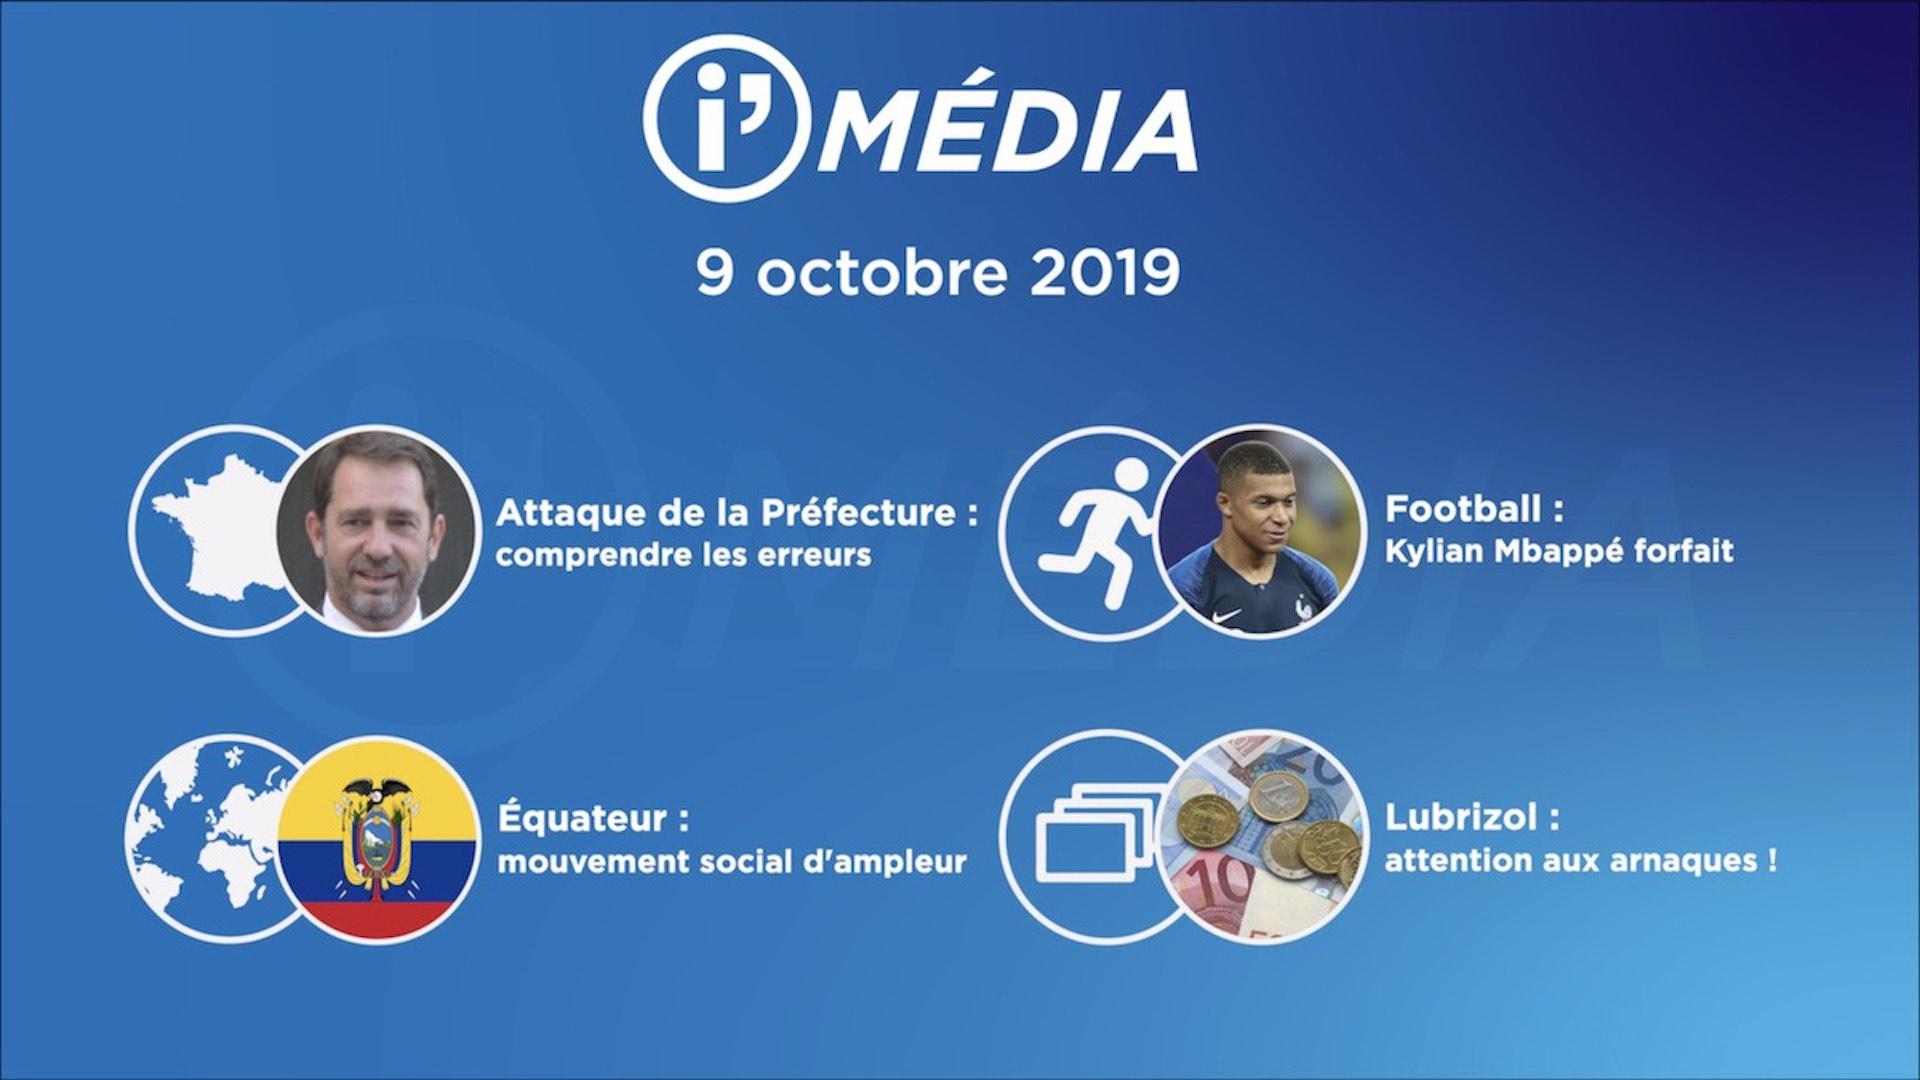 I'média 9 octobre 2019